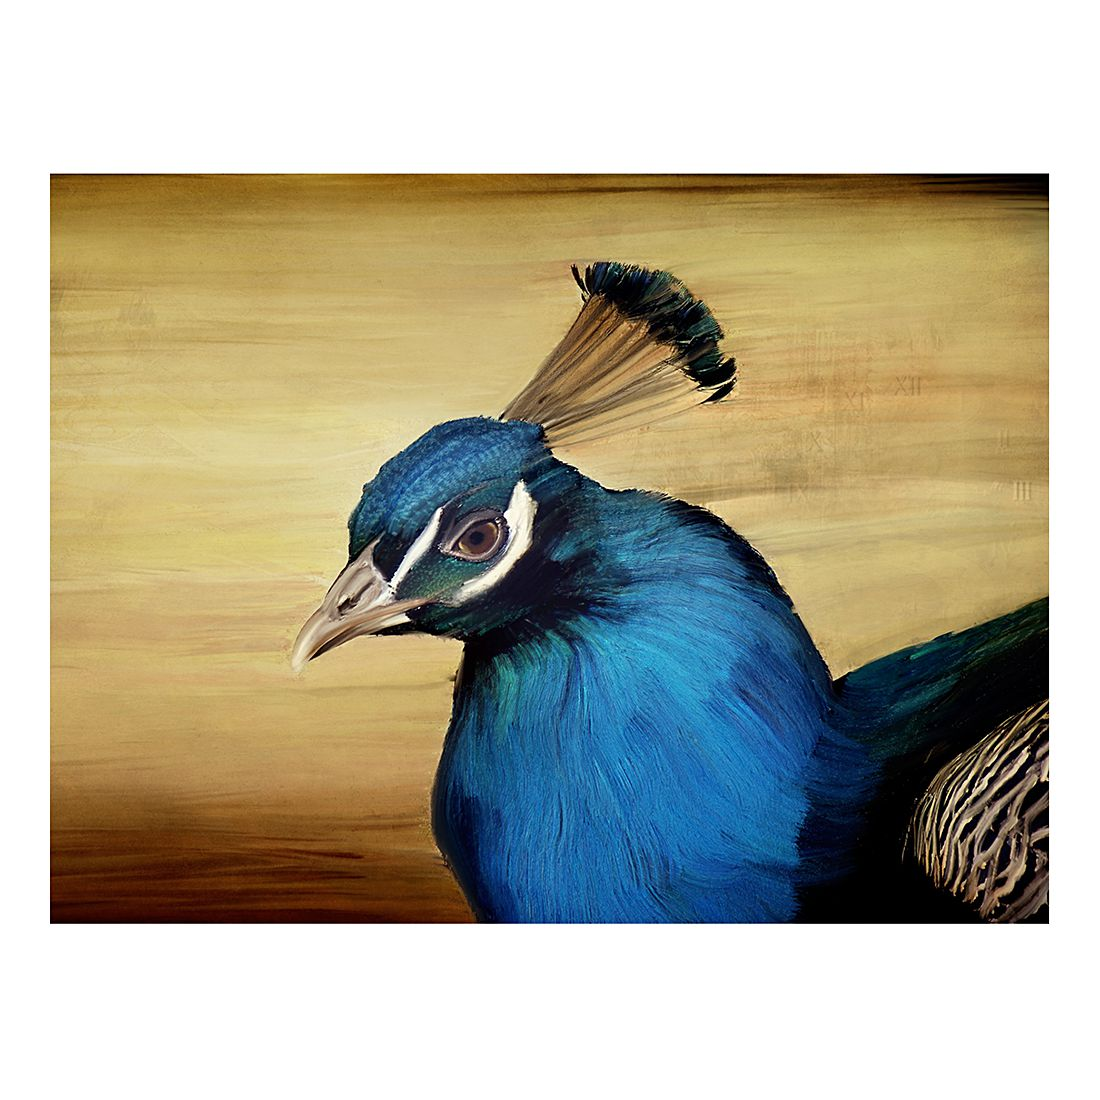 Ölgemälde Blauer Pfau von Angela Dölling – Größe 30 x 40 cm, yourPainting günstig